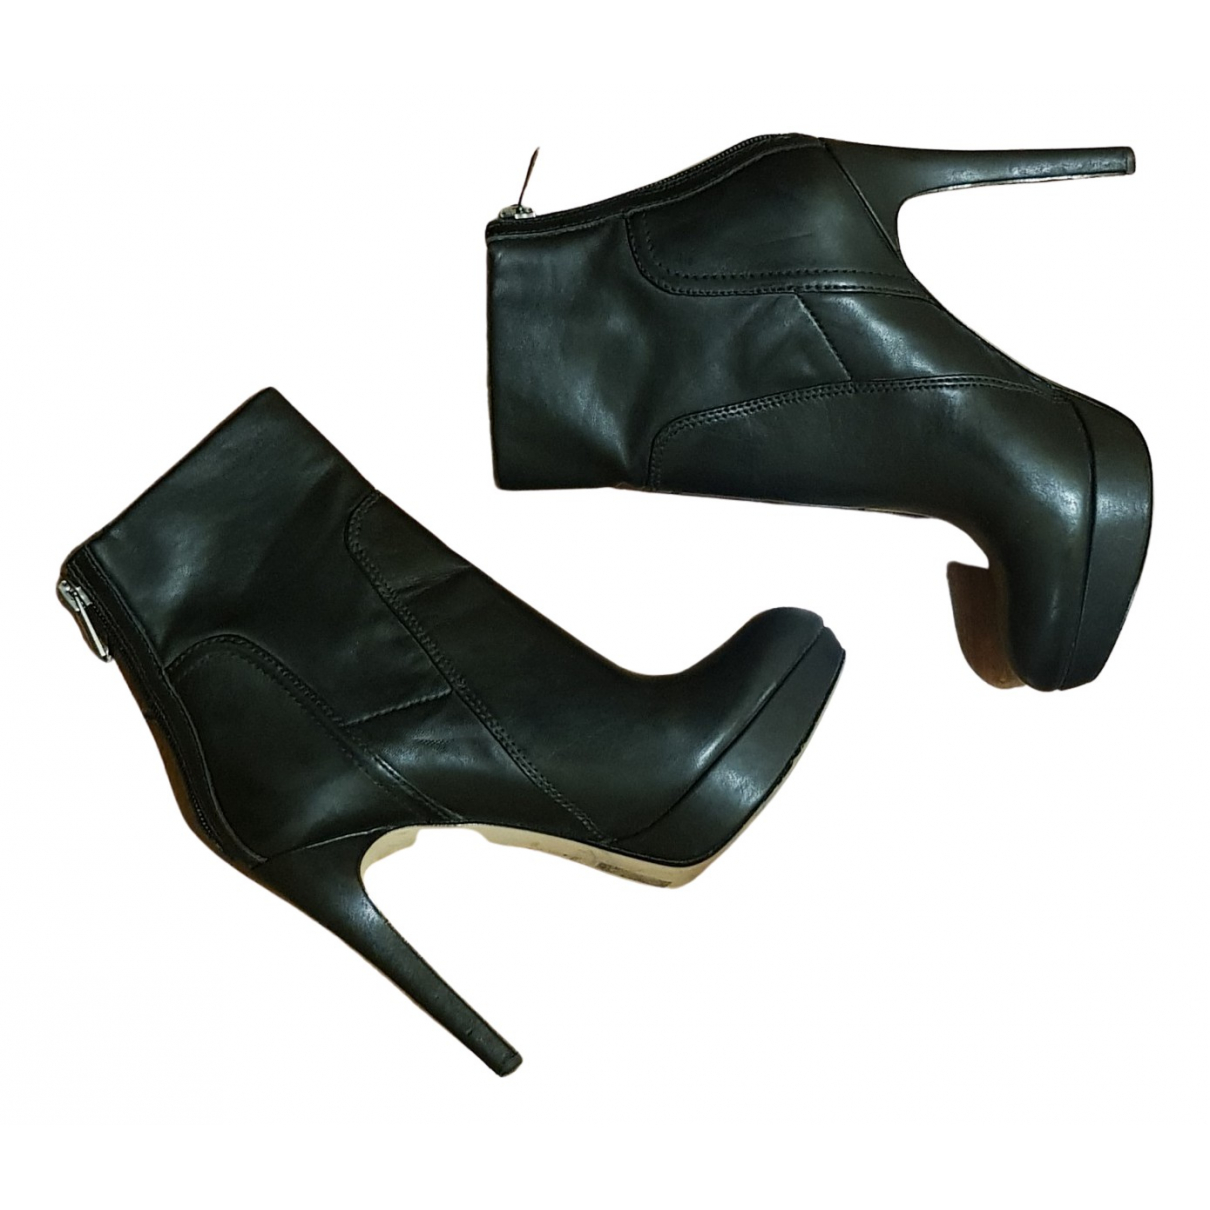 Sam Edelman N Black Leather Ankle boots for Women 36 EU